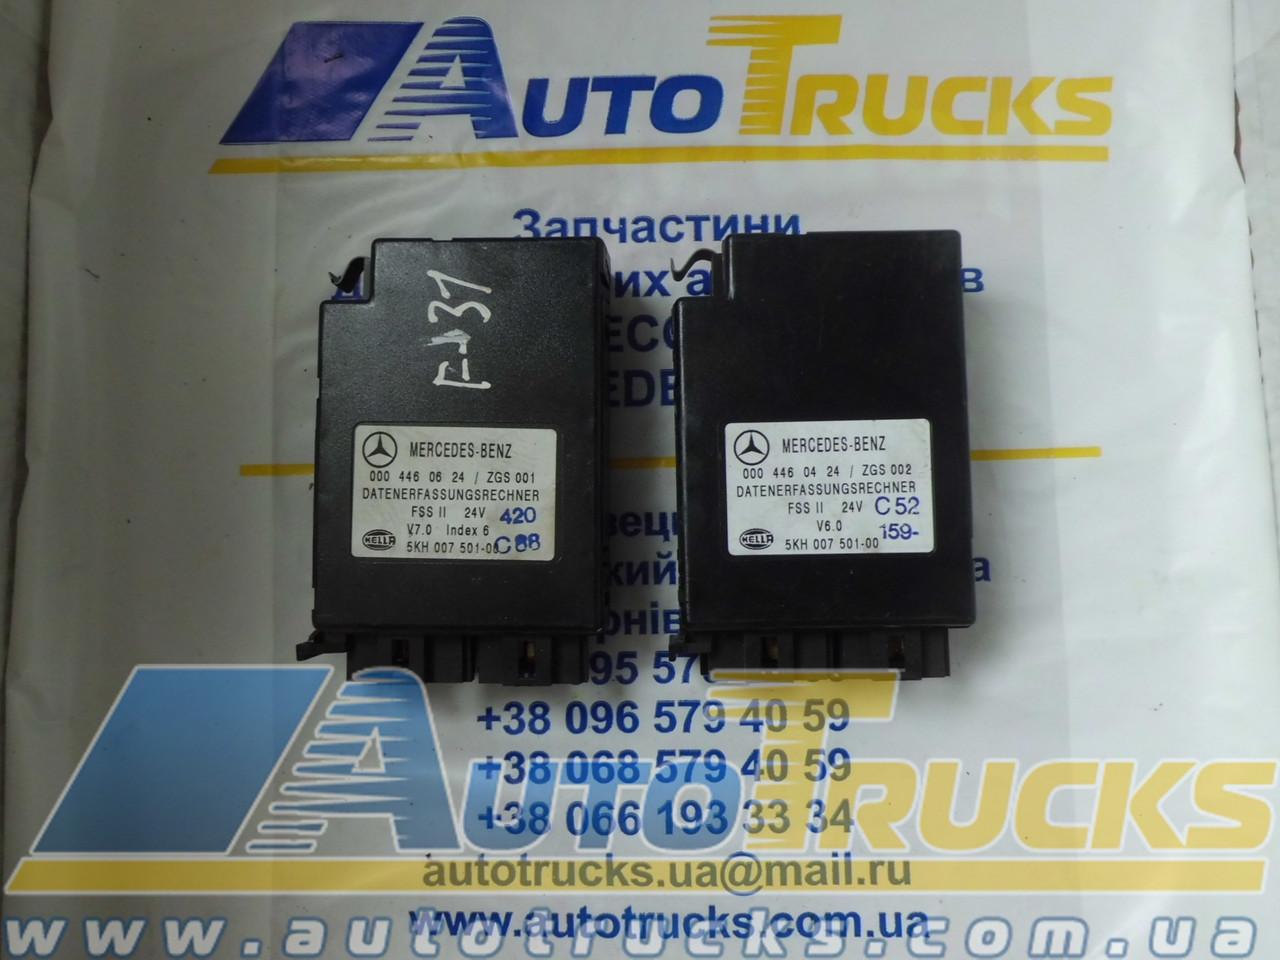 Блок управления ZGS001, ZGS002 Б/у для Mercedes-Benz (0004460624)